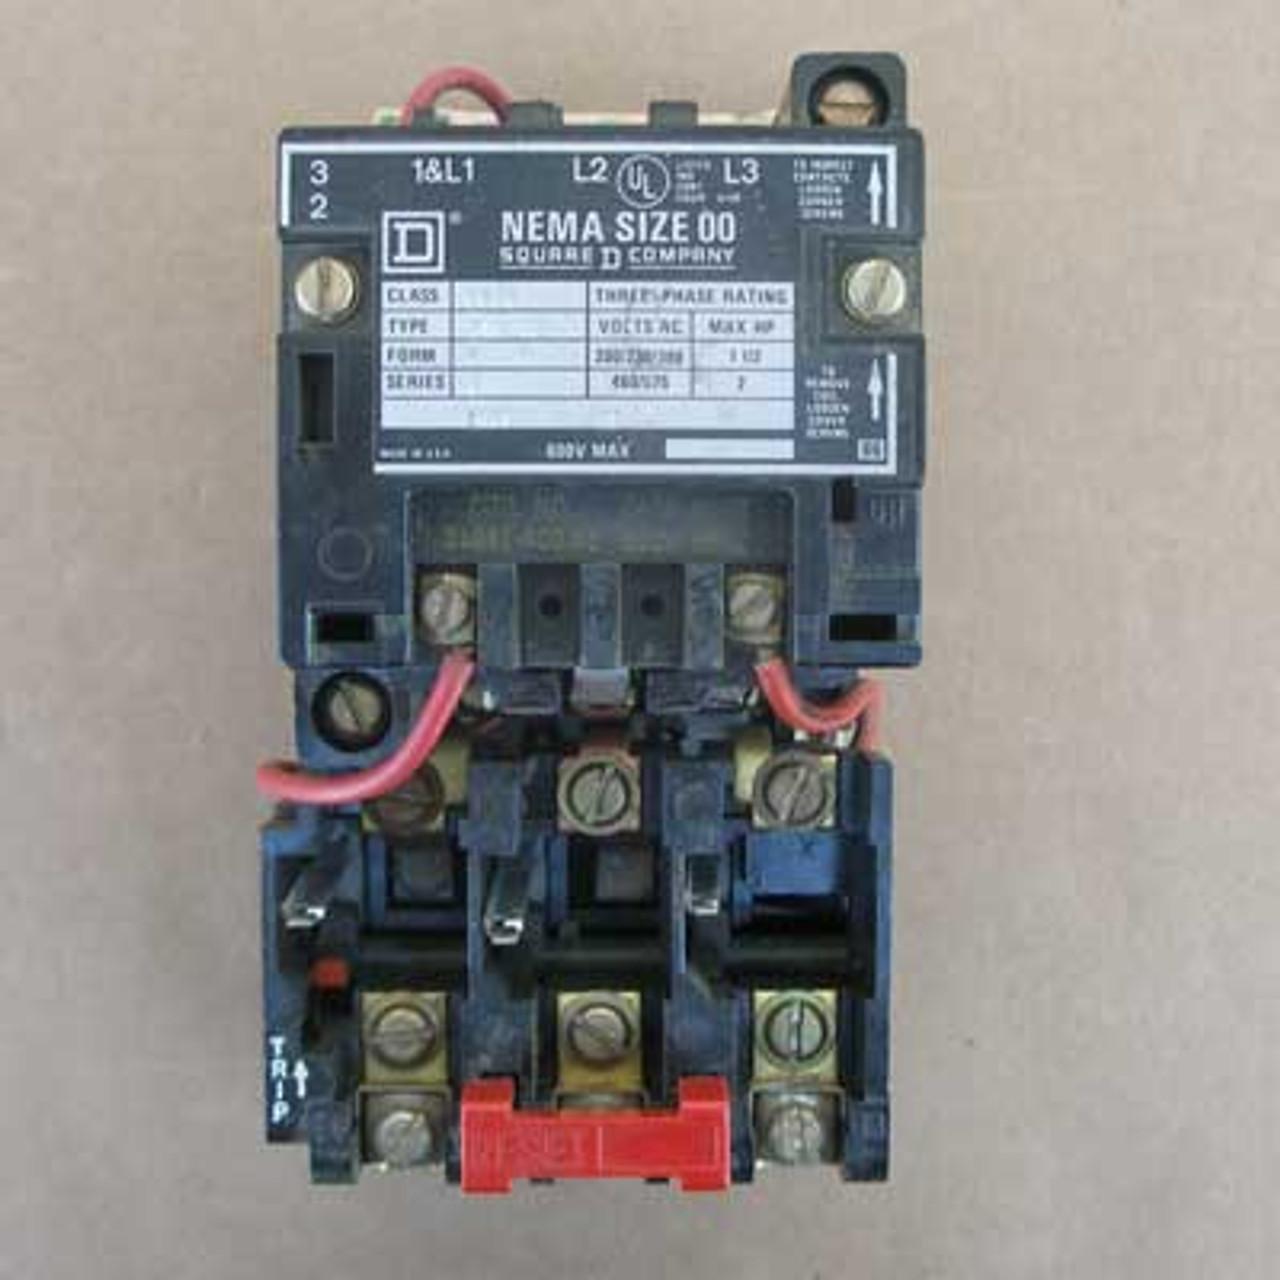 Square D 8536-SAG12 Size 00 Starter 3 Phase 120V Coil Open - Used